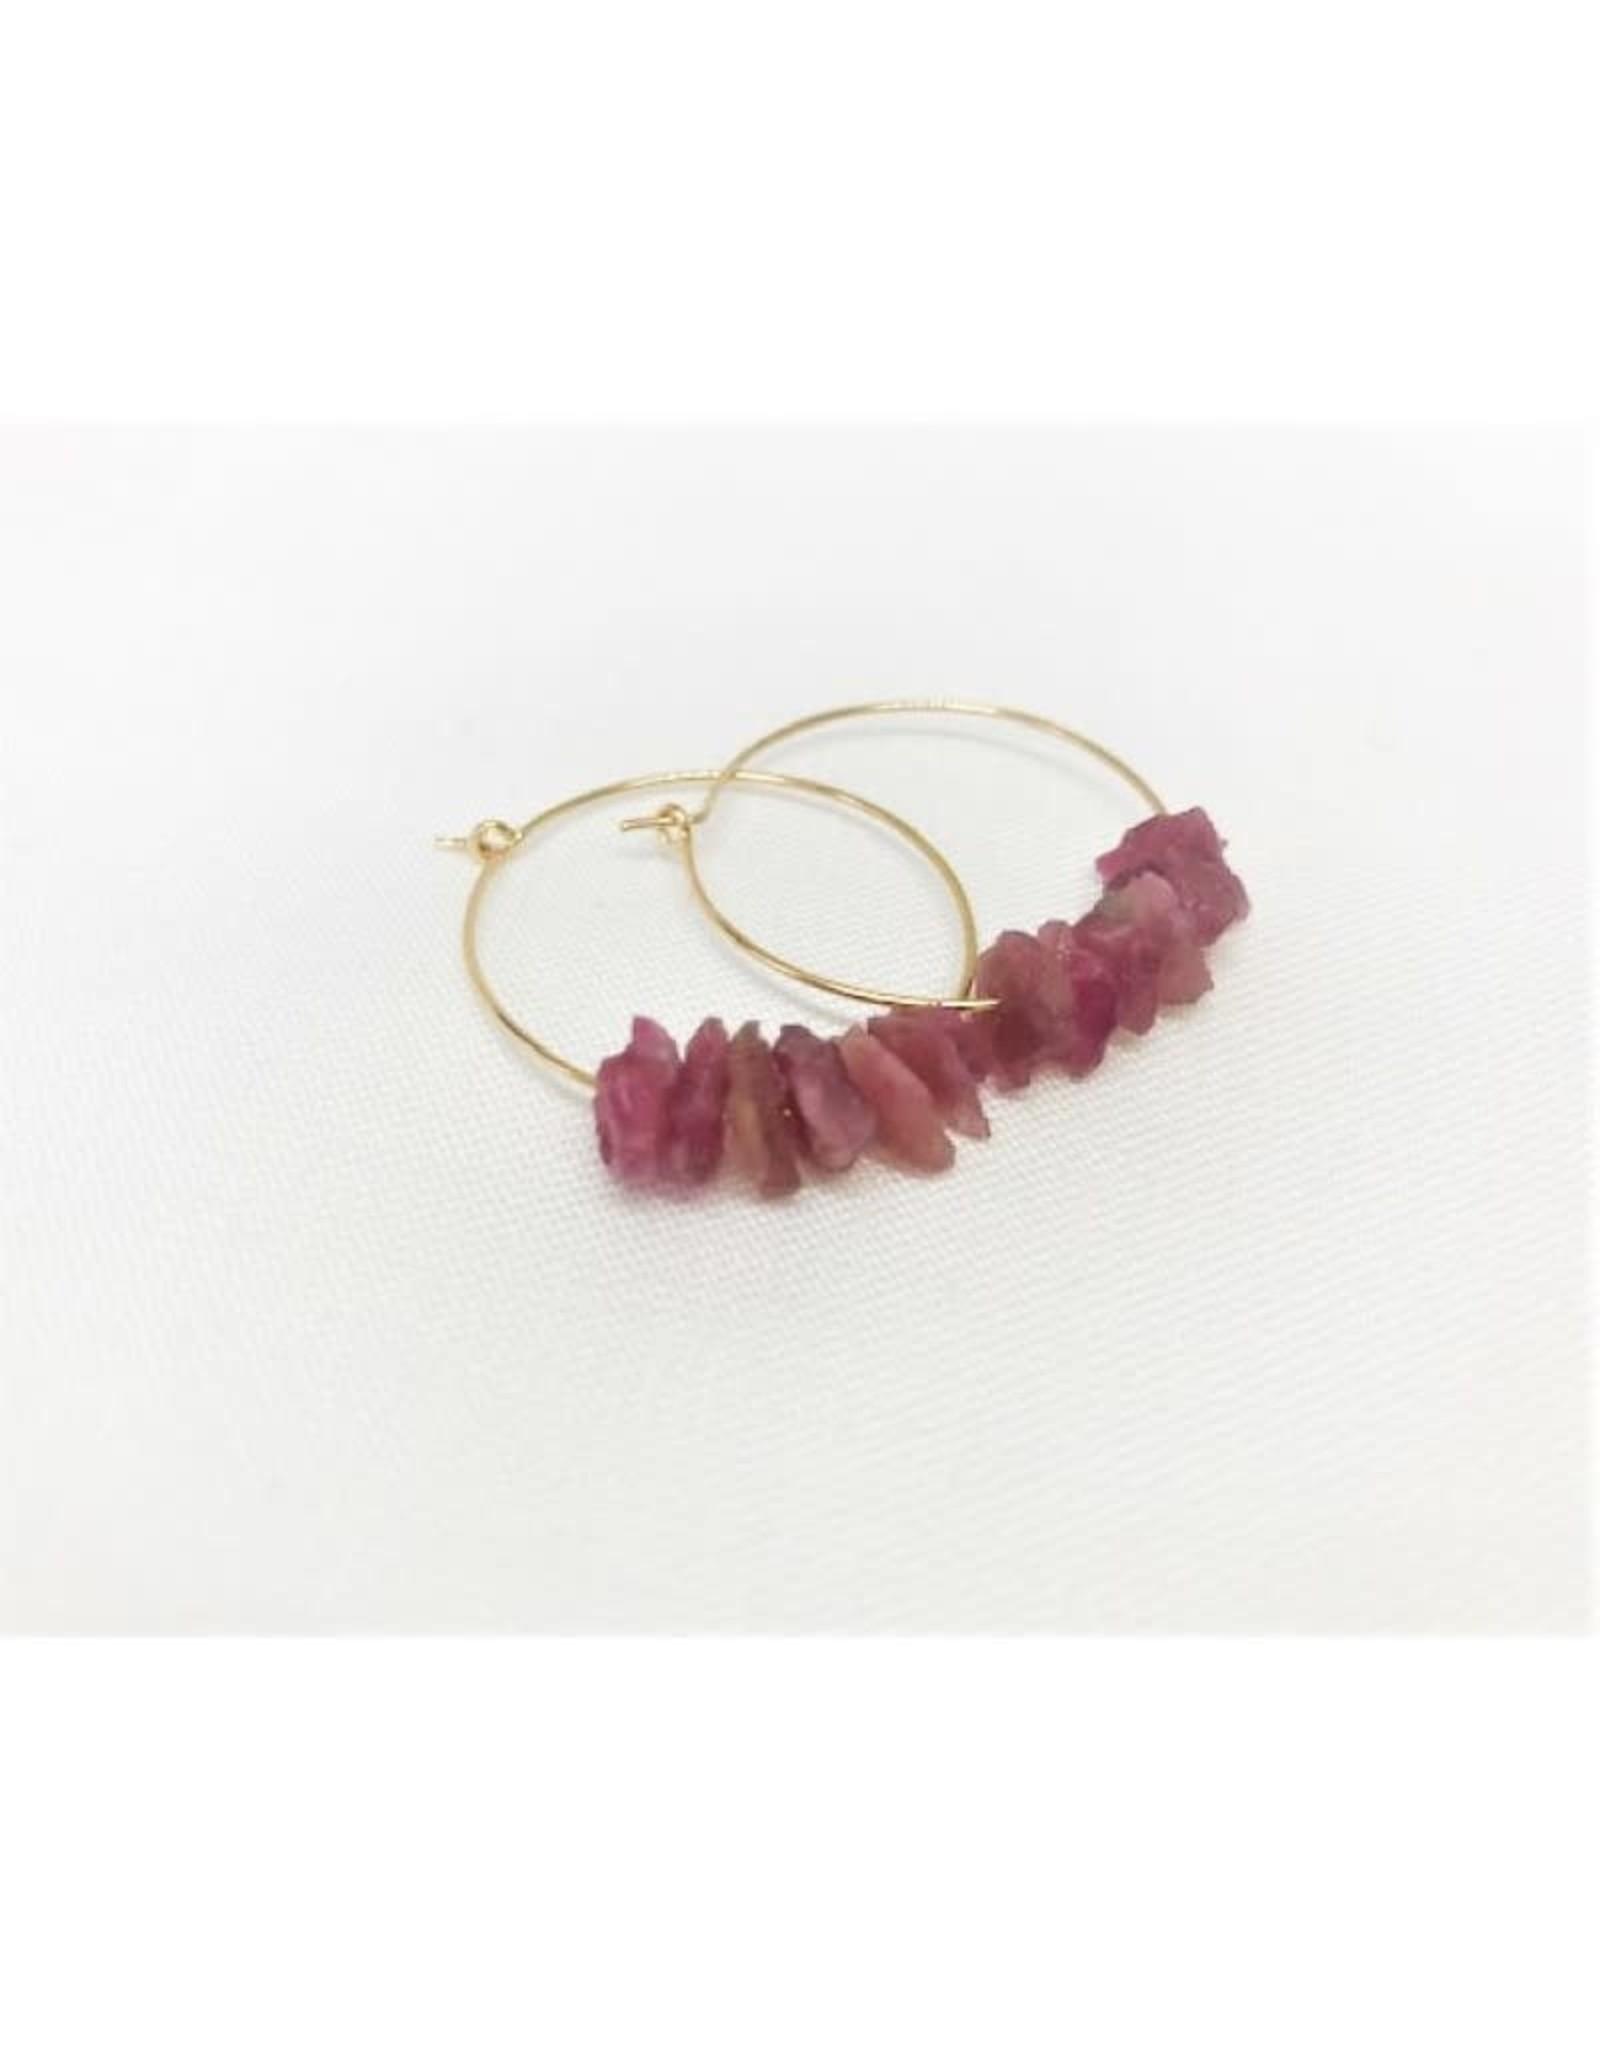 Hoop Earrings - Pink Tourmaline/Gold/Sm